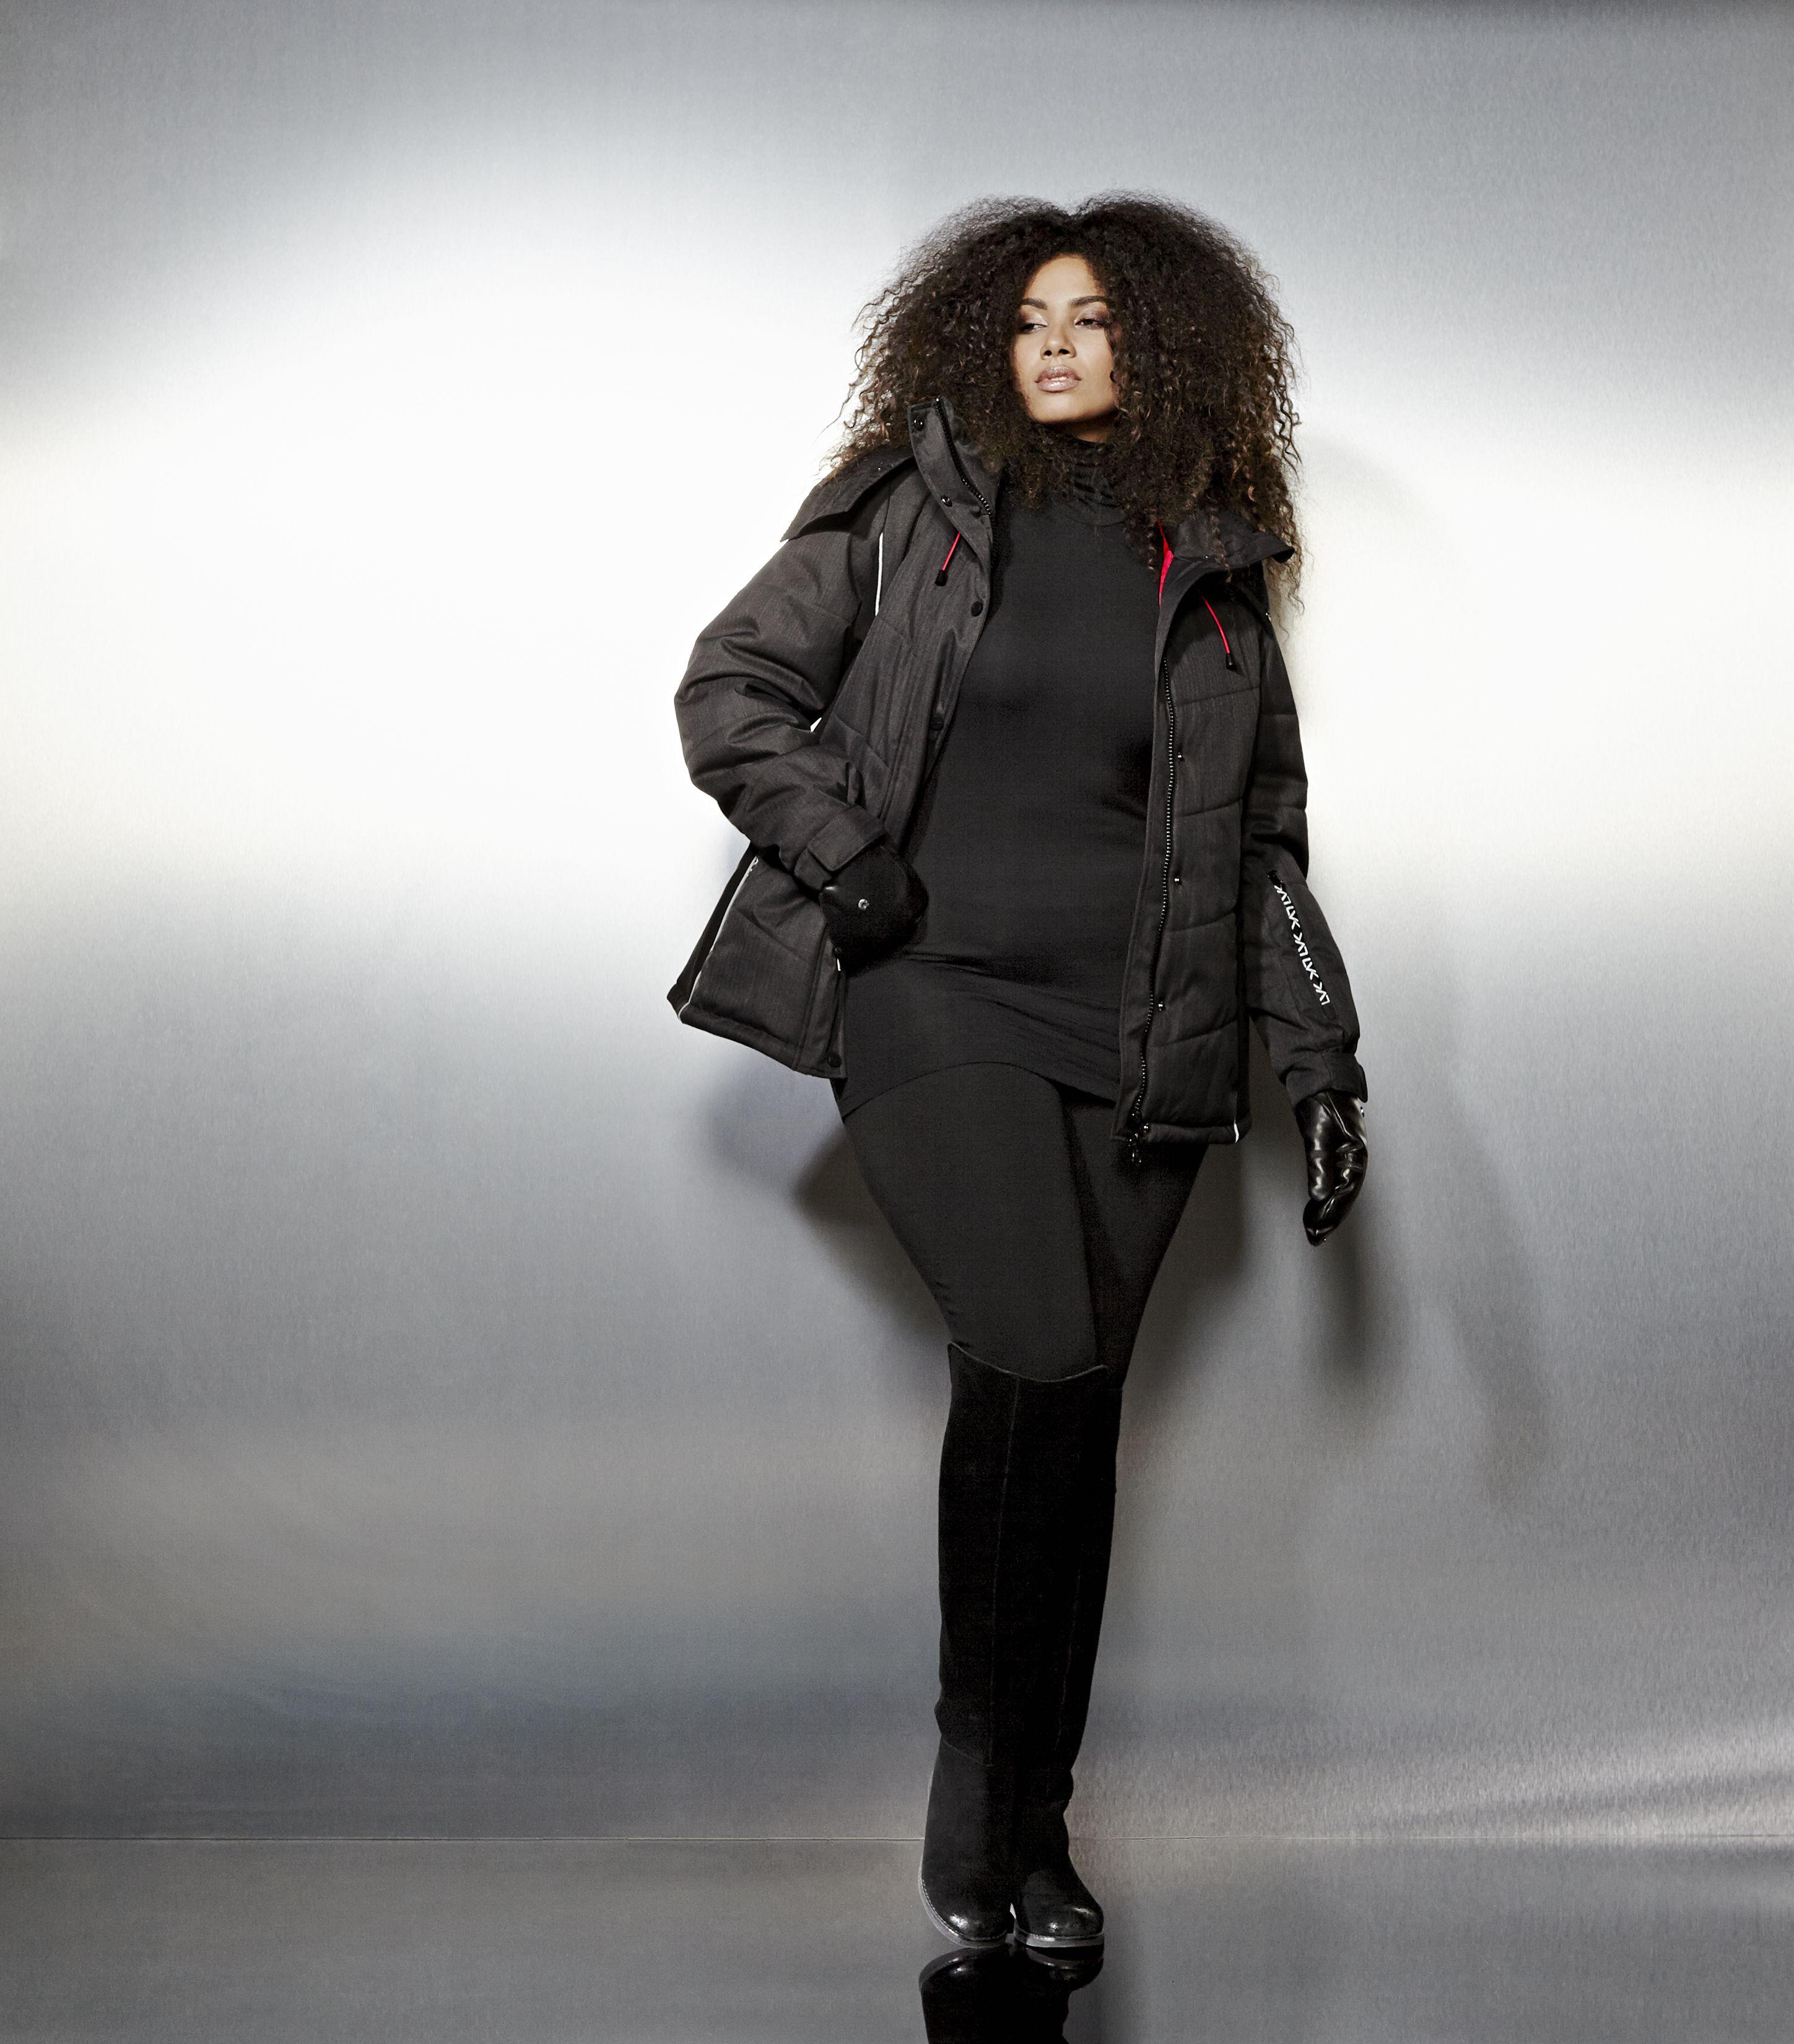 Livik Ski Jacket Plus Size Coats Plus Size Outfits Plus Size Outerwear [ 3300 x 2897 Pixel ]